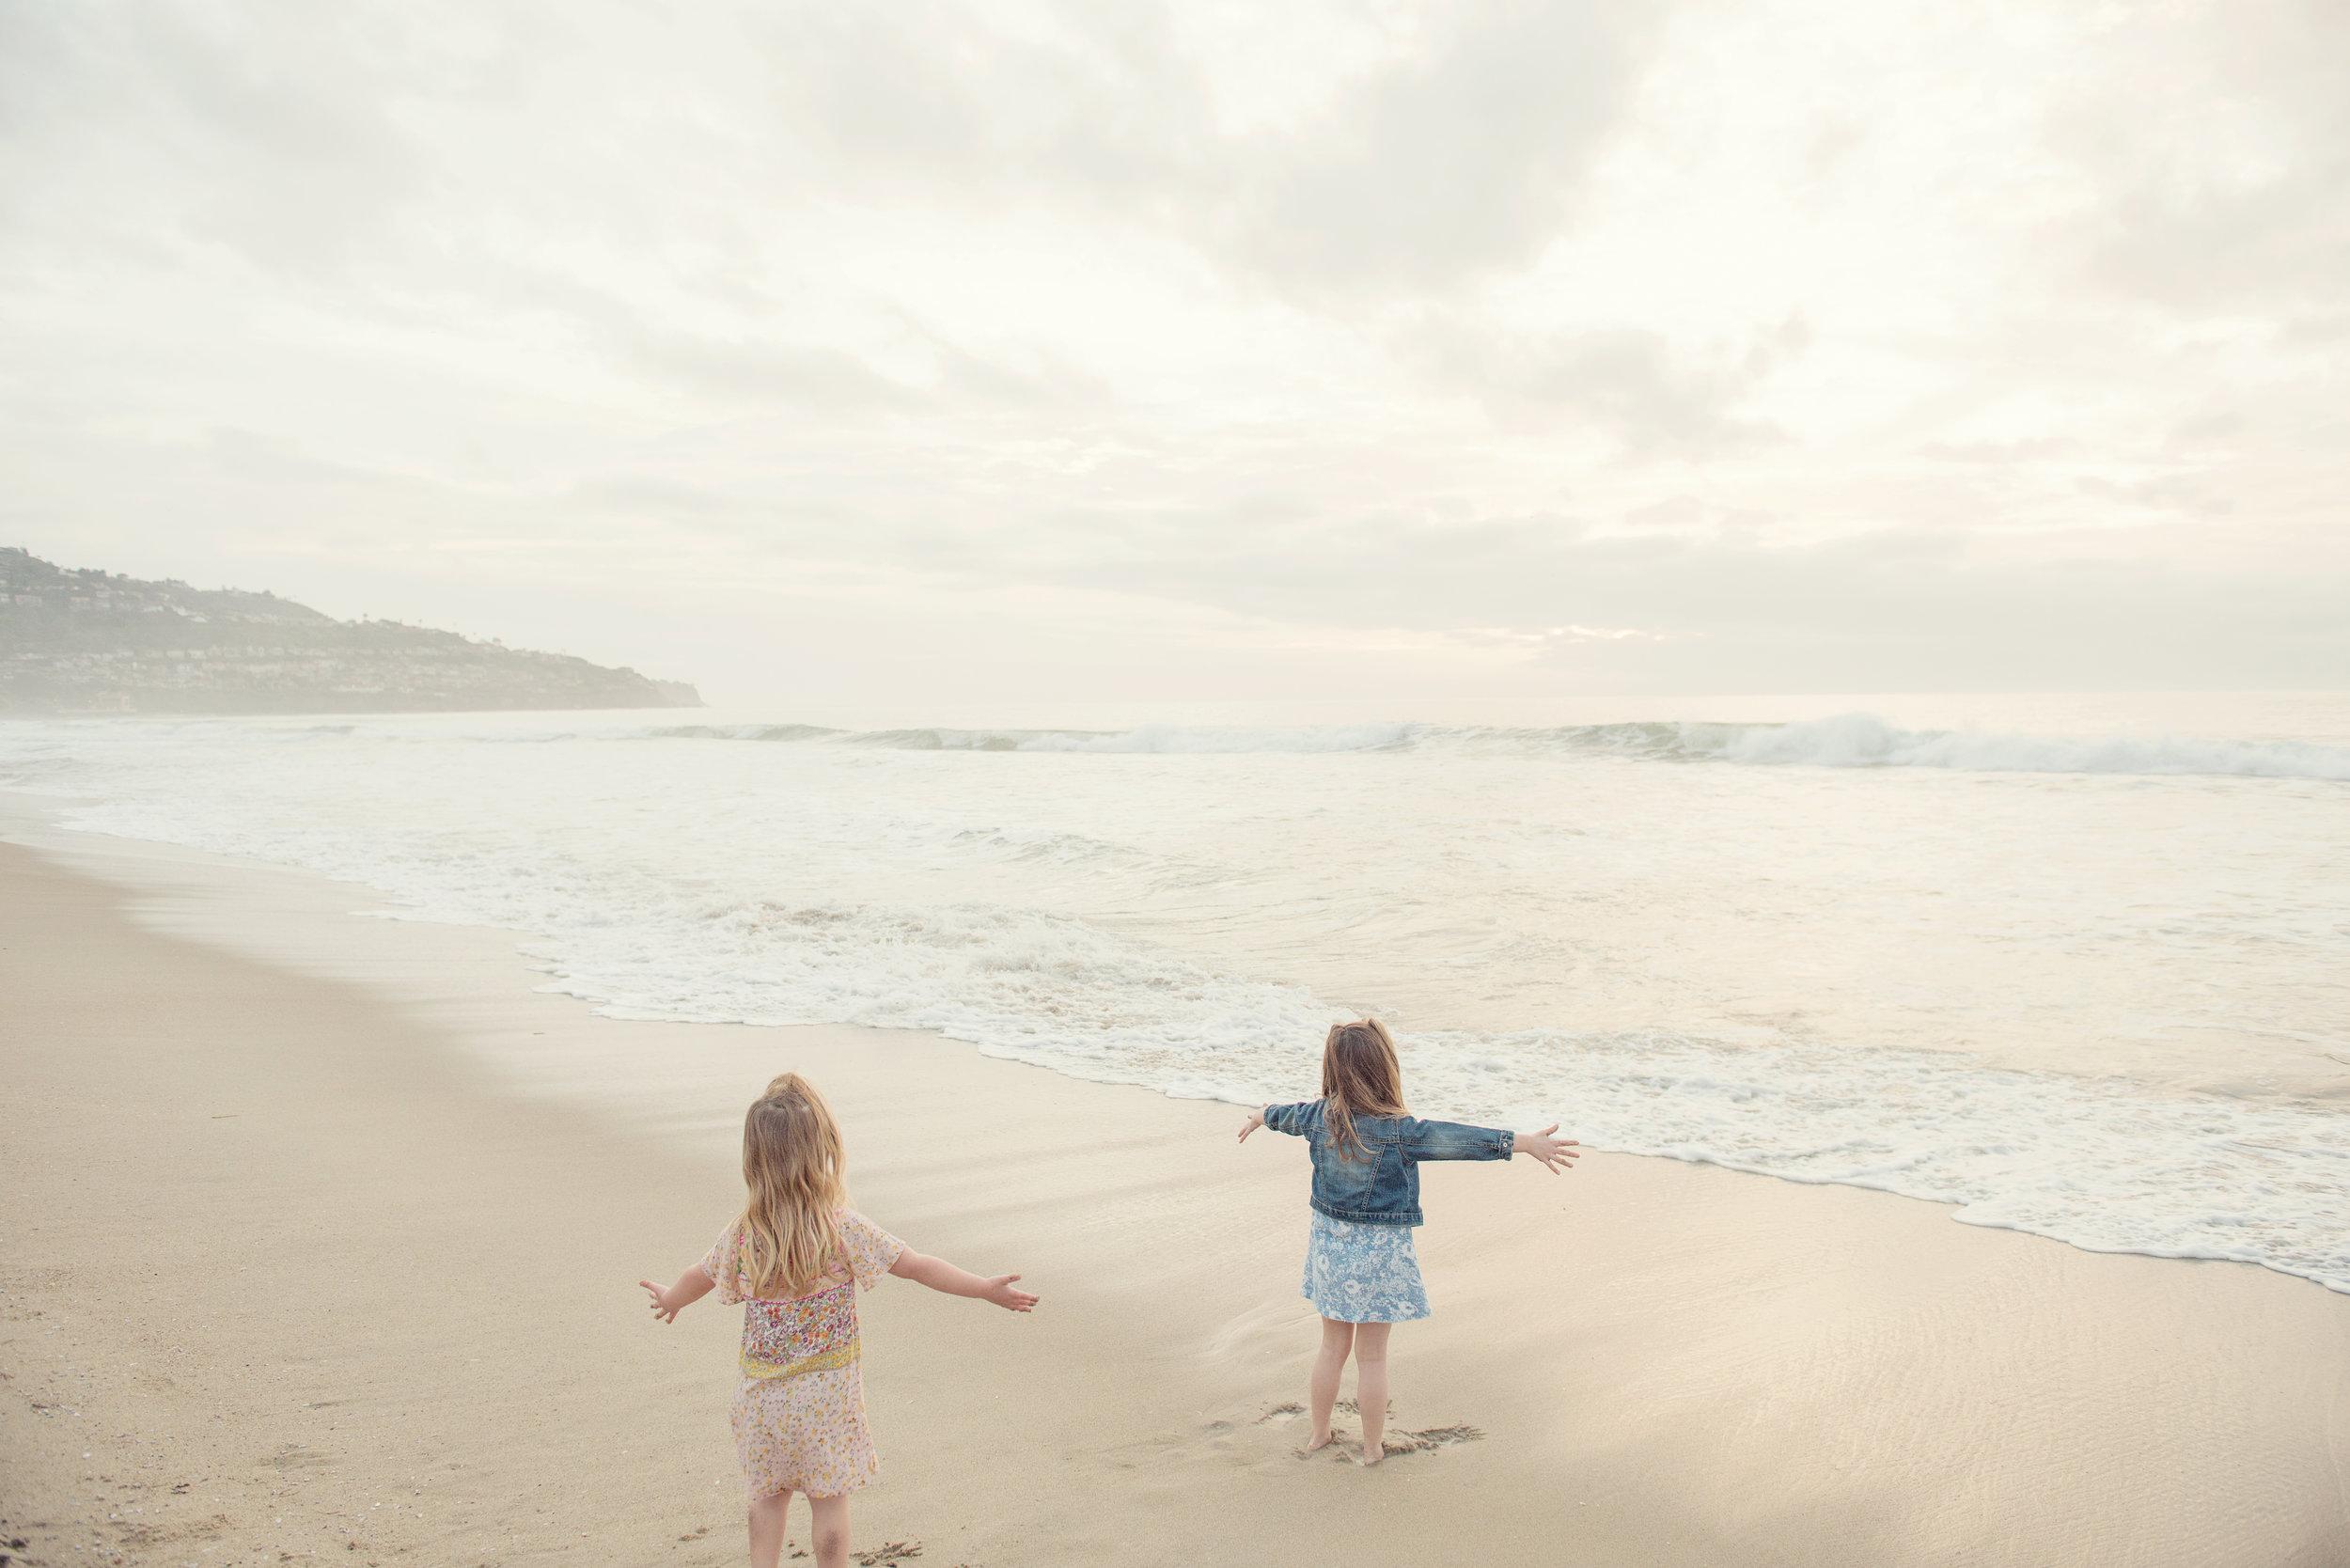 sample_beach-6.jpg